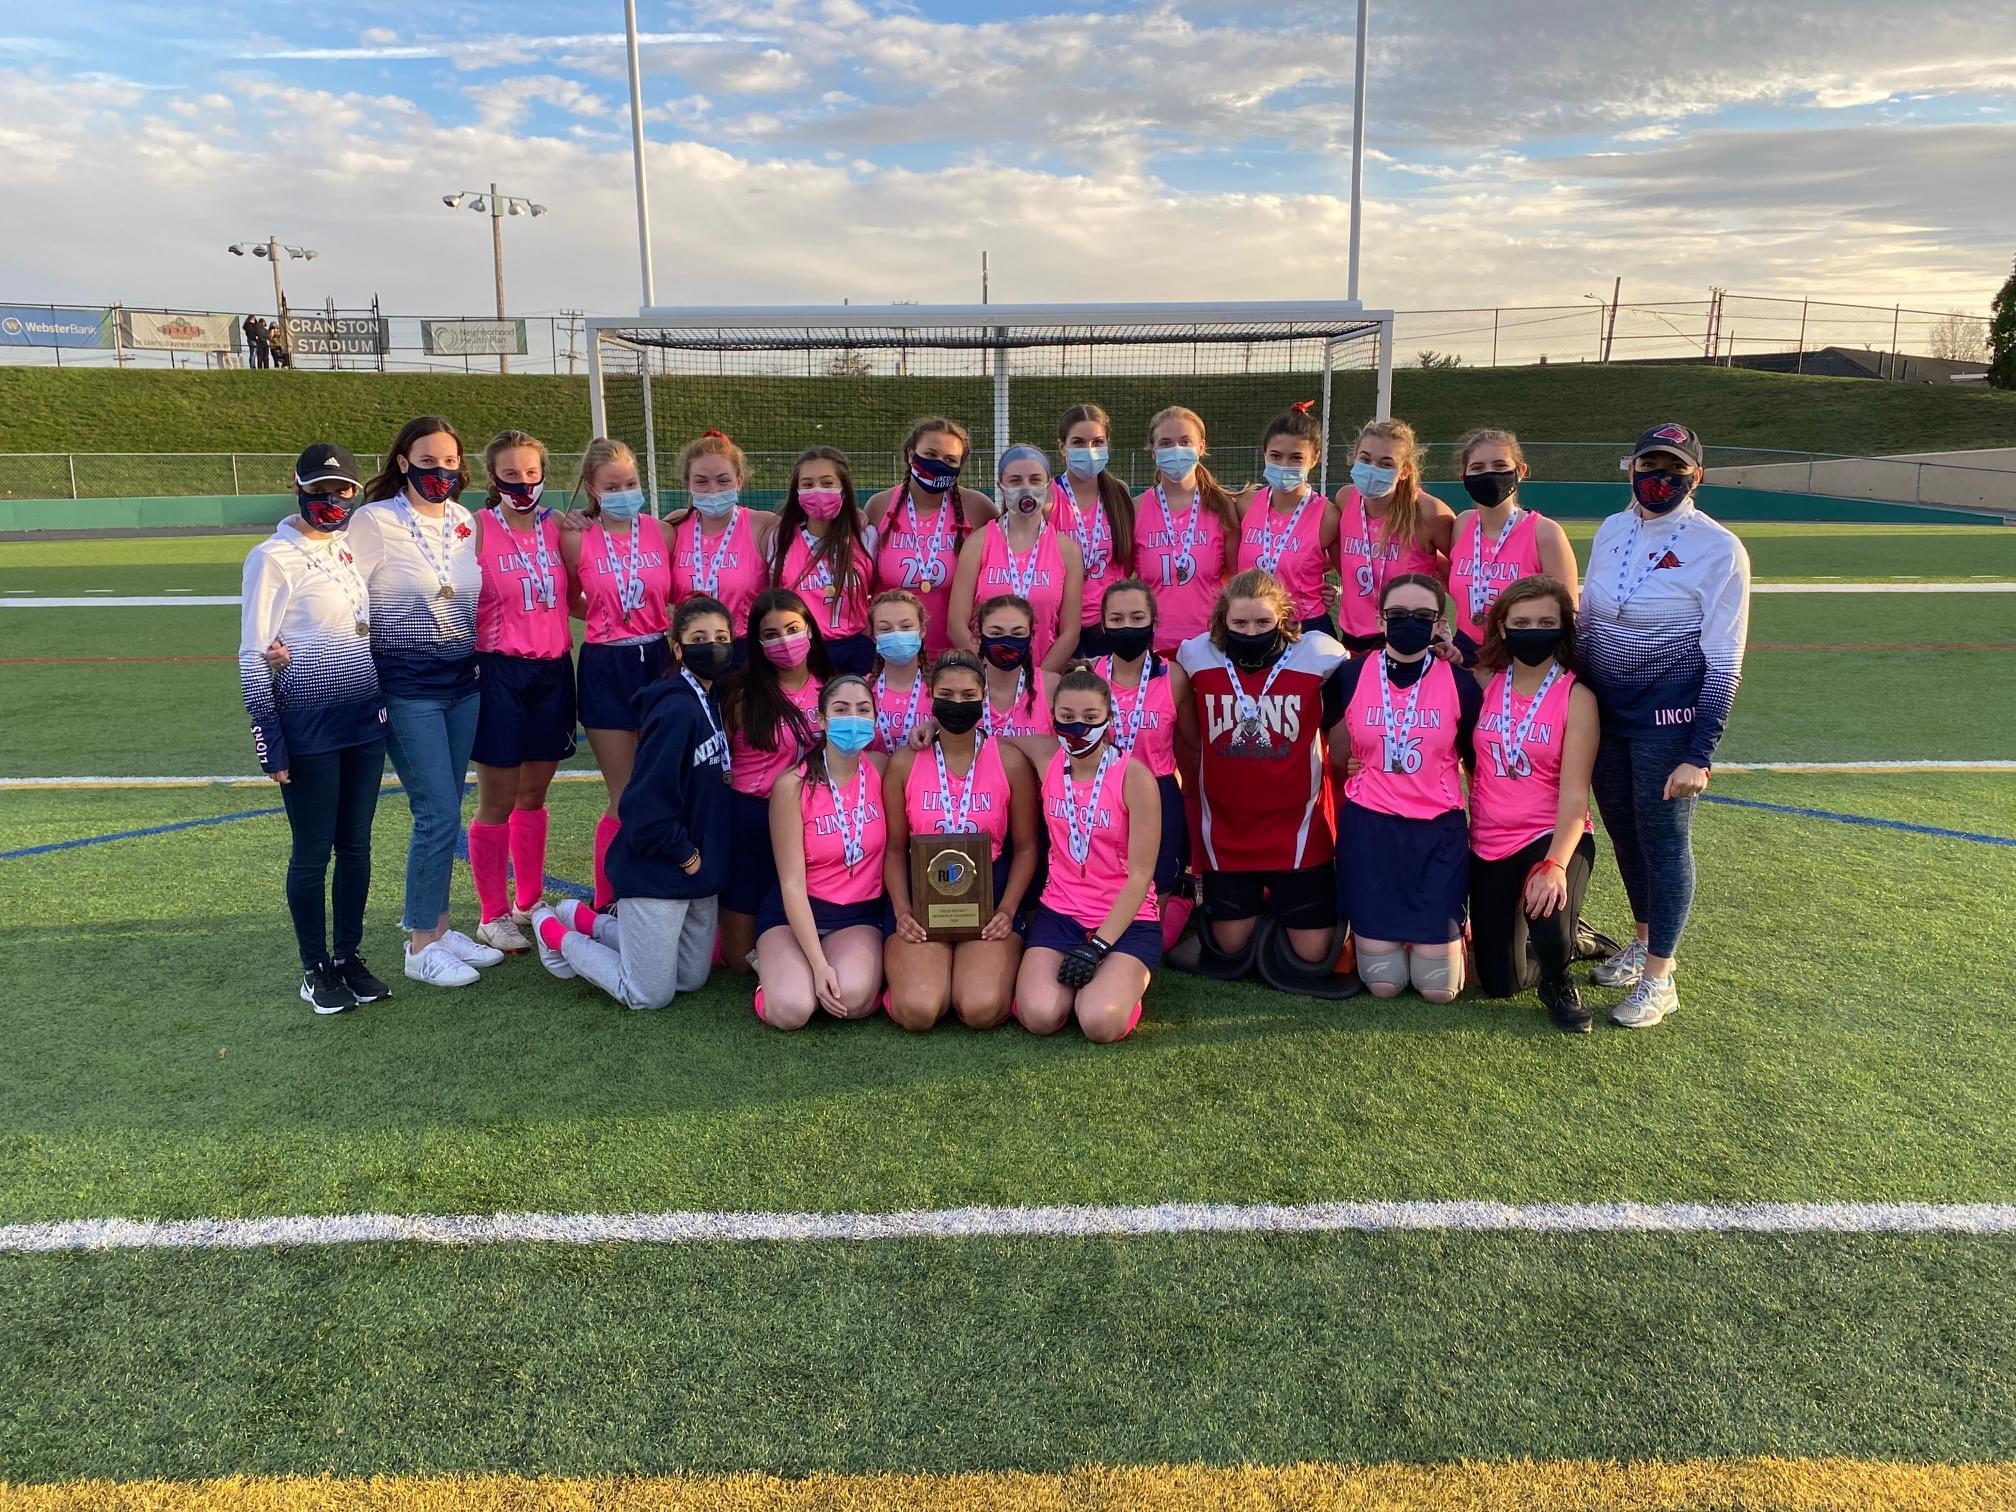 Lincoln High School Girls Field Hockey